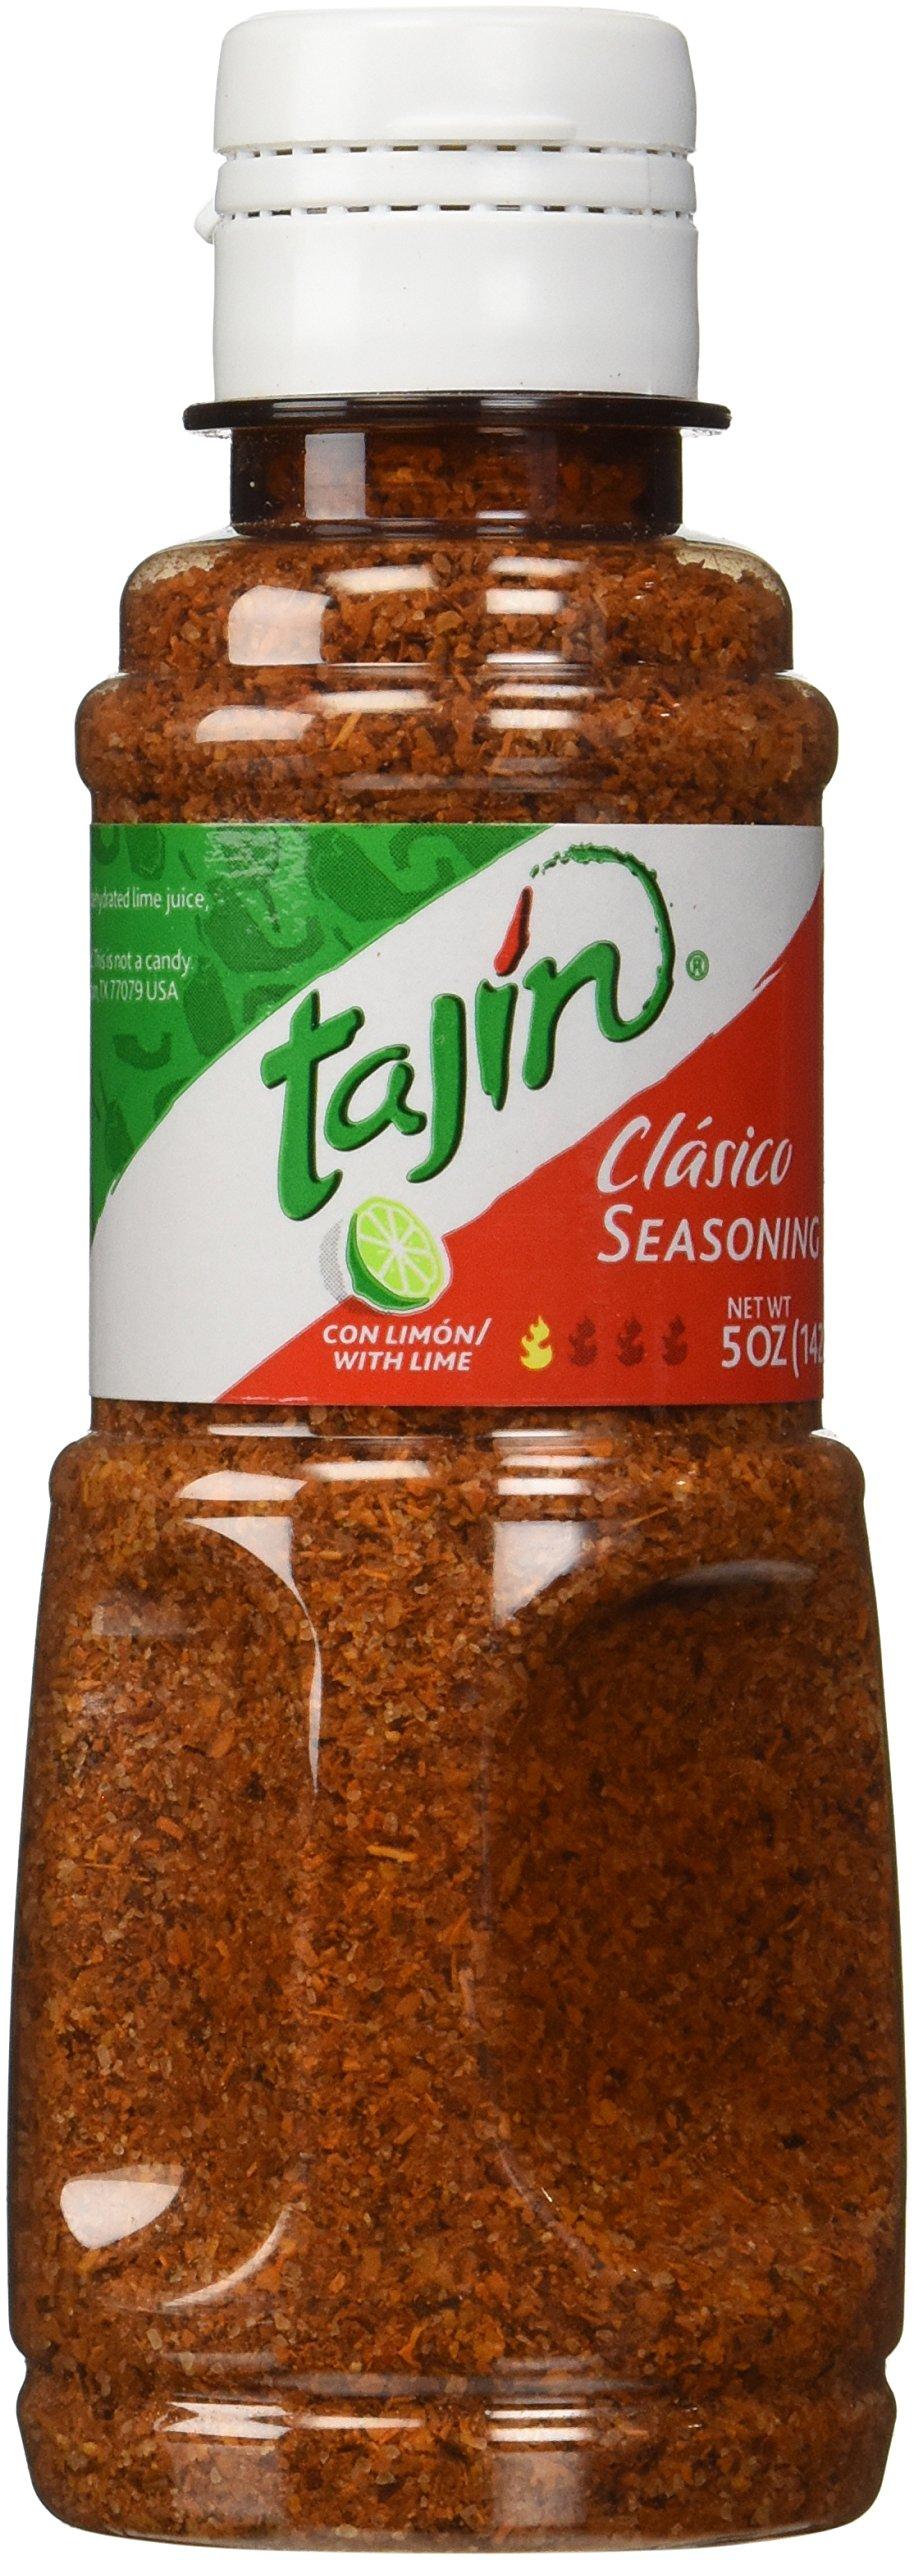 Tajin Clásico Seasoning Chily Powder for Fruits and Veggies, 5 Oz (Pack of 3)